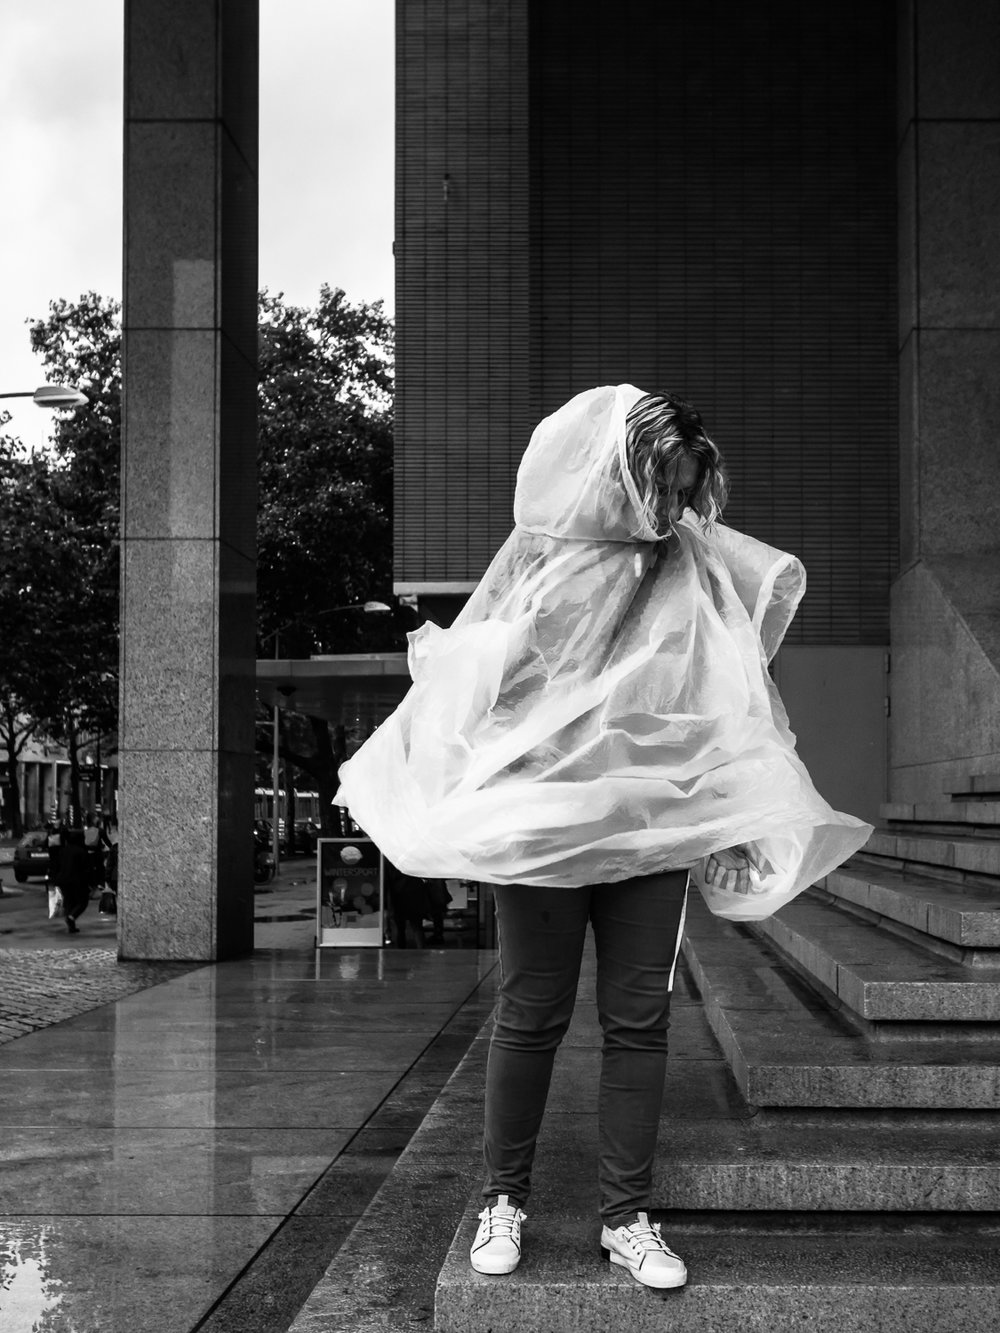 fokko muller street photography - 171007 - 005.jpg